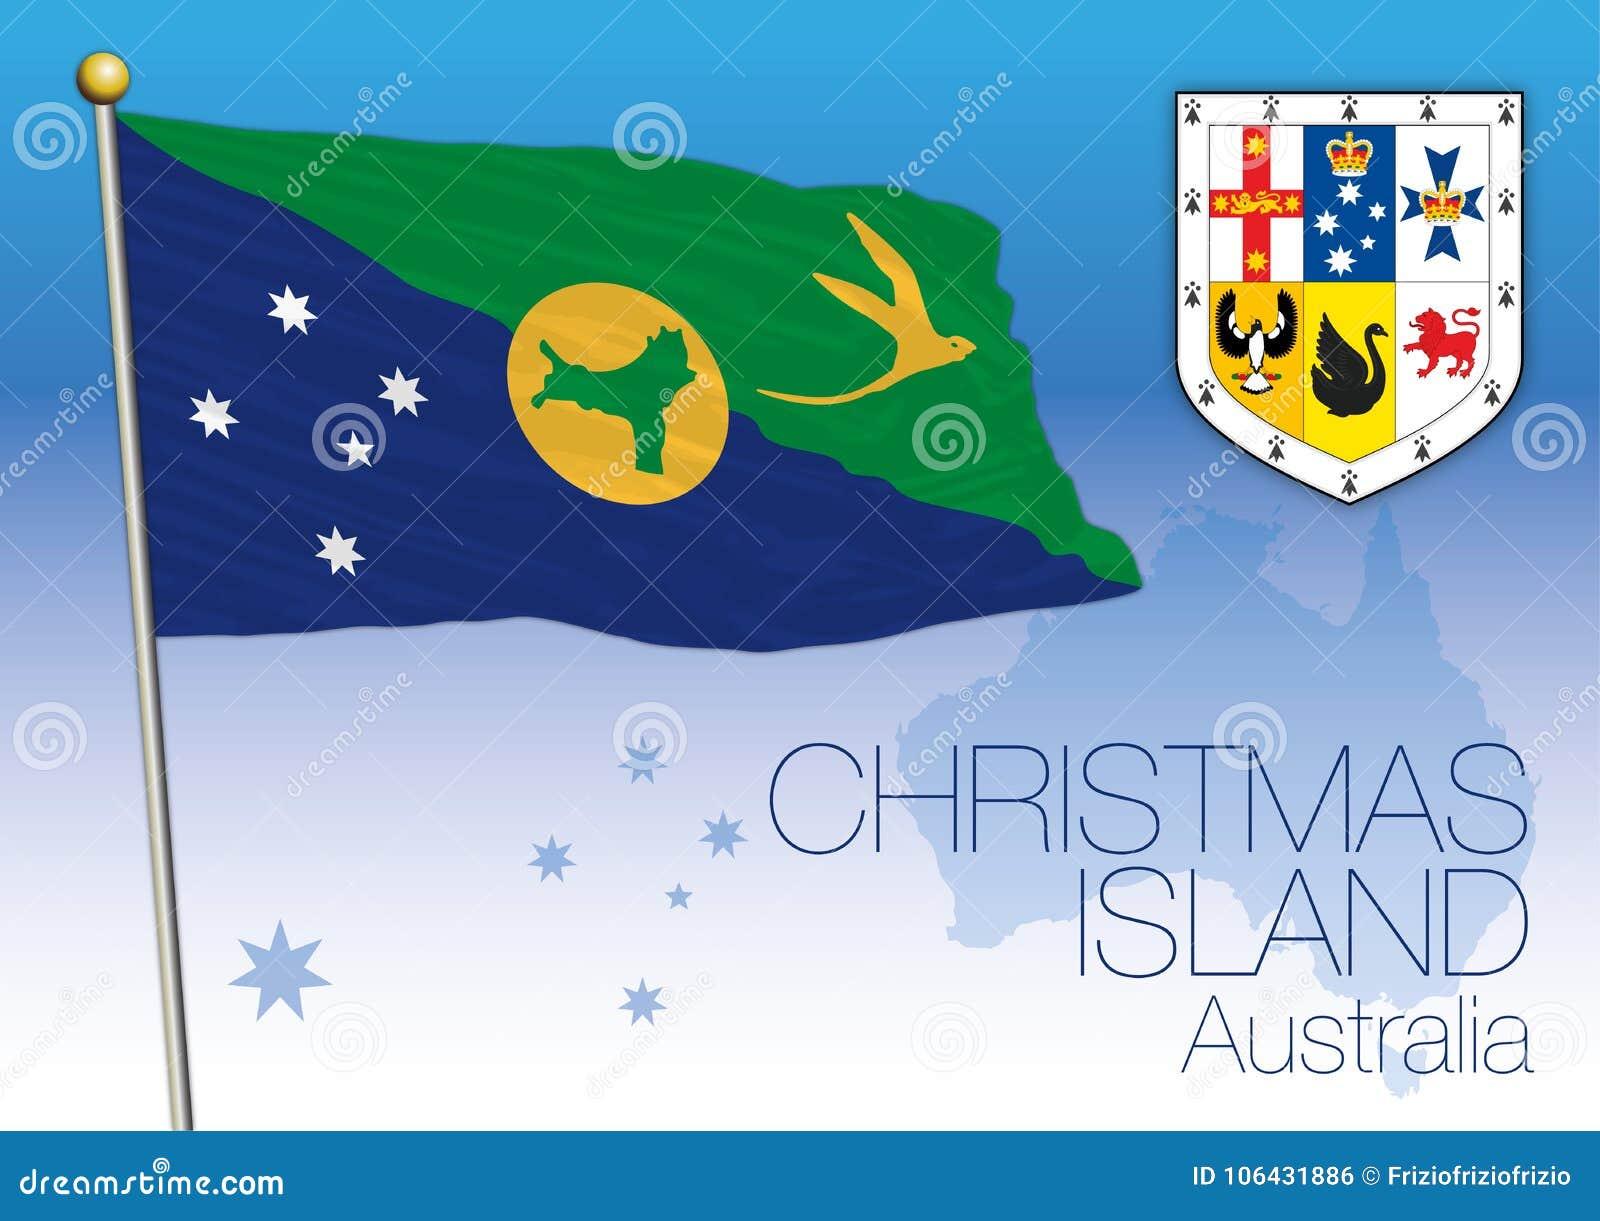 Christmas Island Flag Of The State And Territory Australia Stock